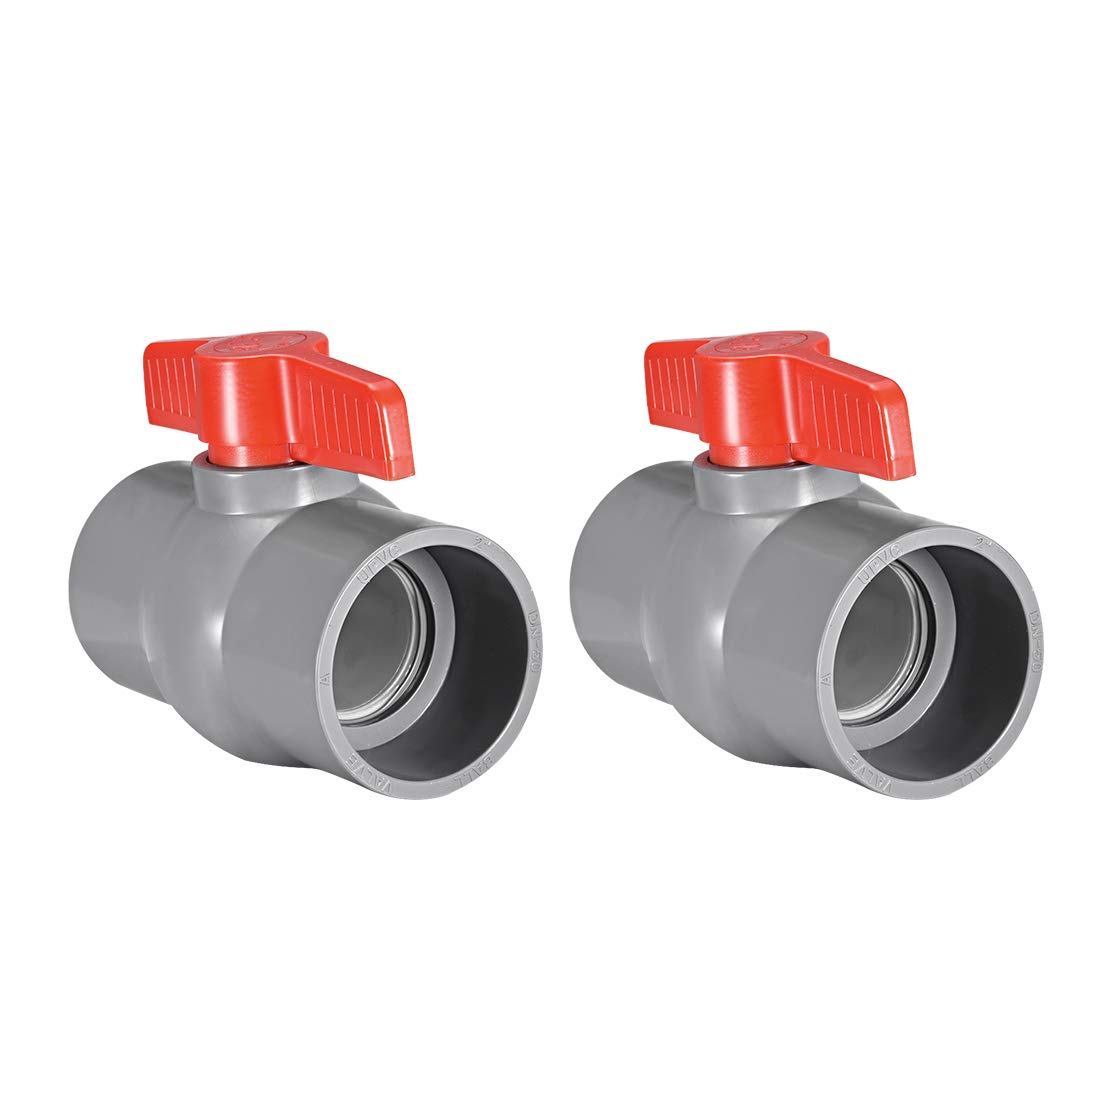 sourcing map 2Stk PVC Kugelhahn Wasserversorgungsrohr Gleitkanten 2 Innenlochdiameter Rot Grau